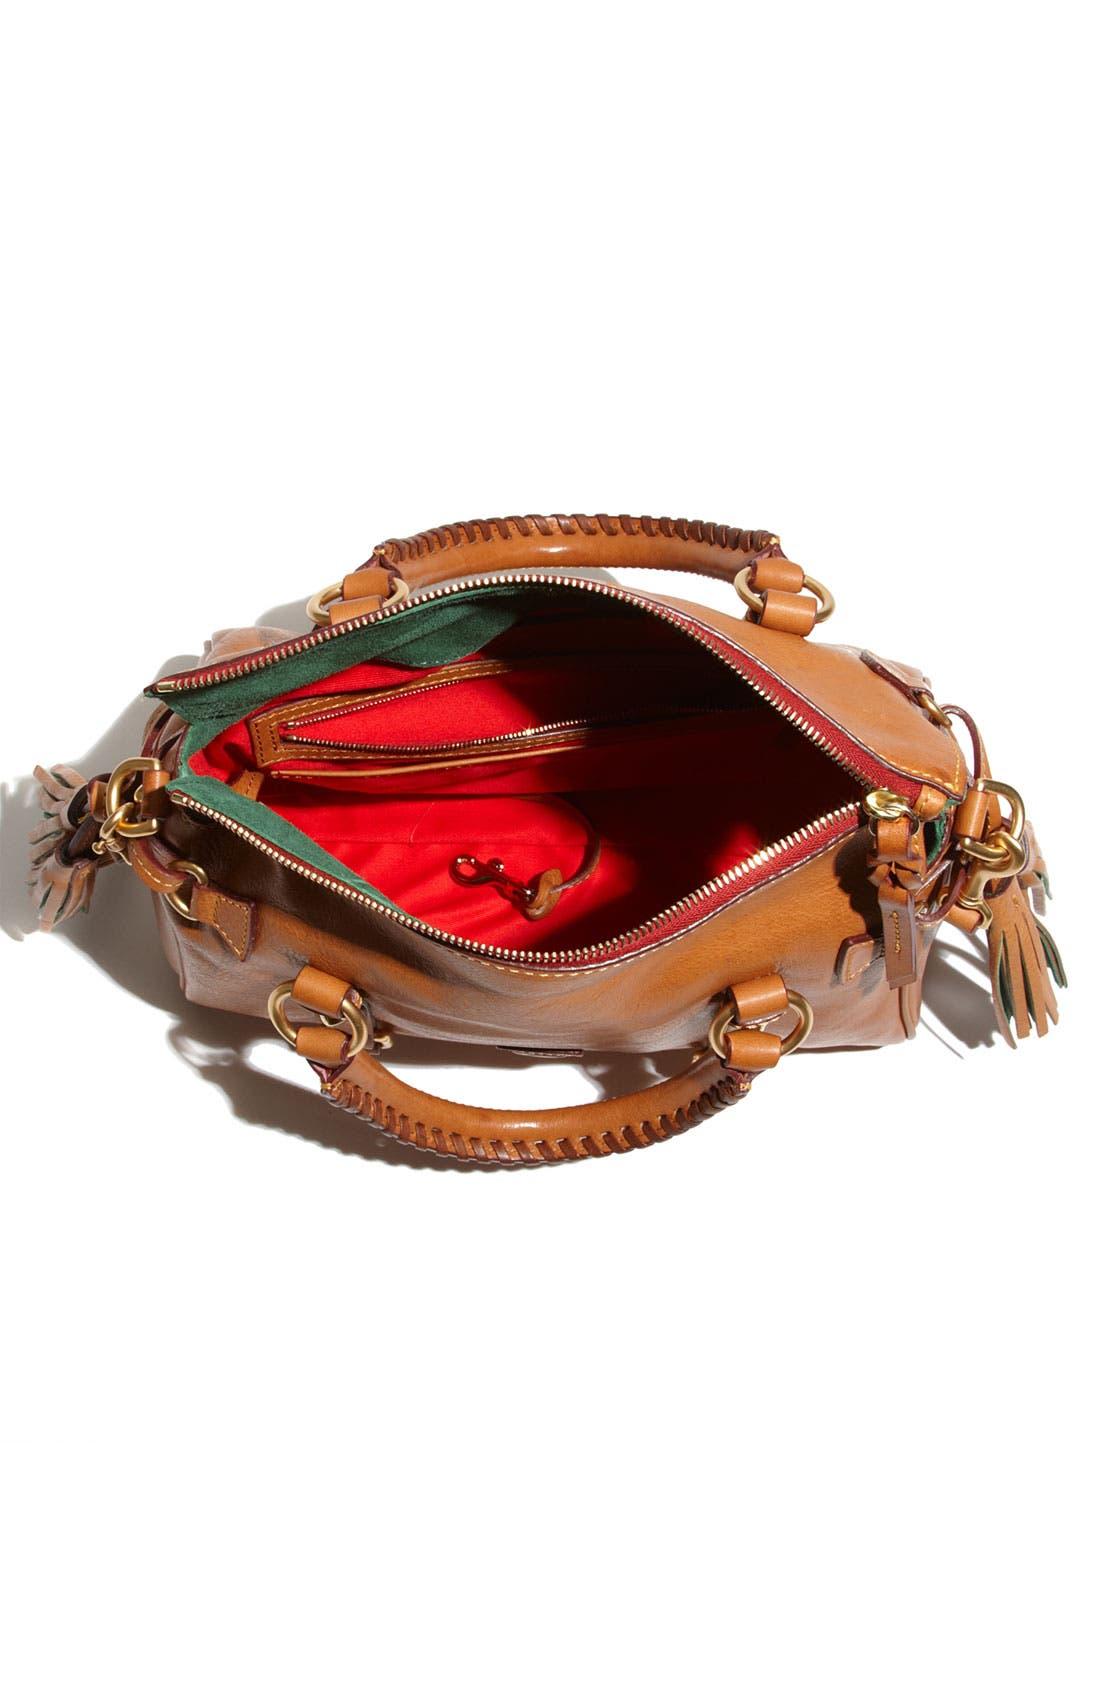 Alternate Image 3  - Dooney & Bourke 'Mini - Florentine Collection' Leather Satchel